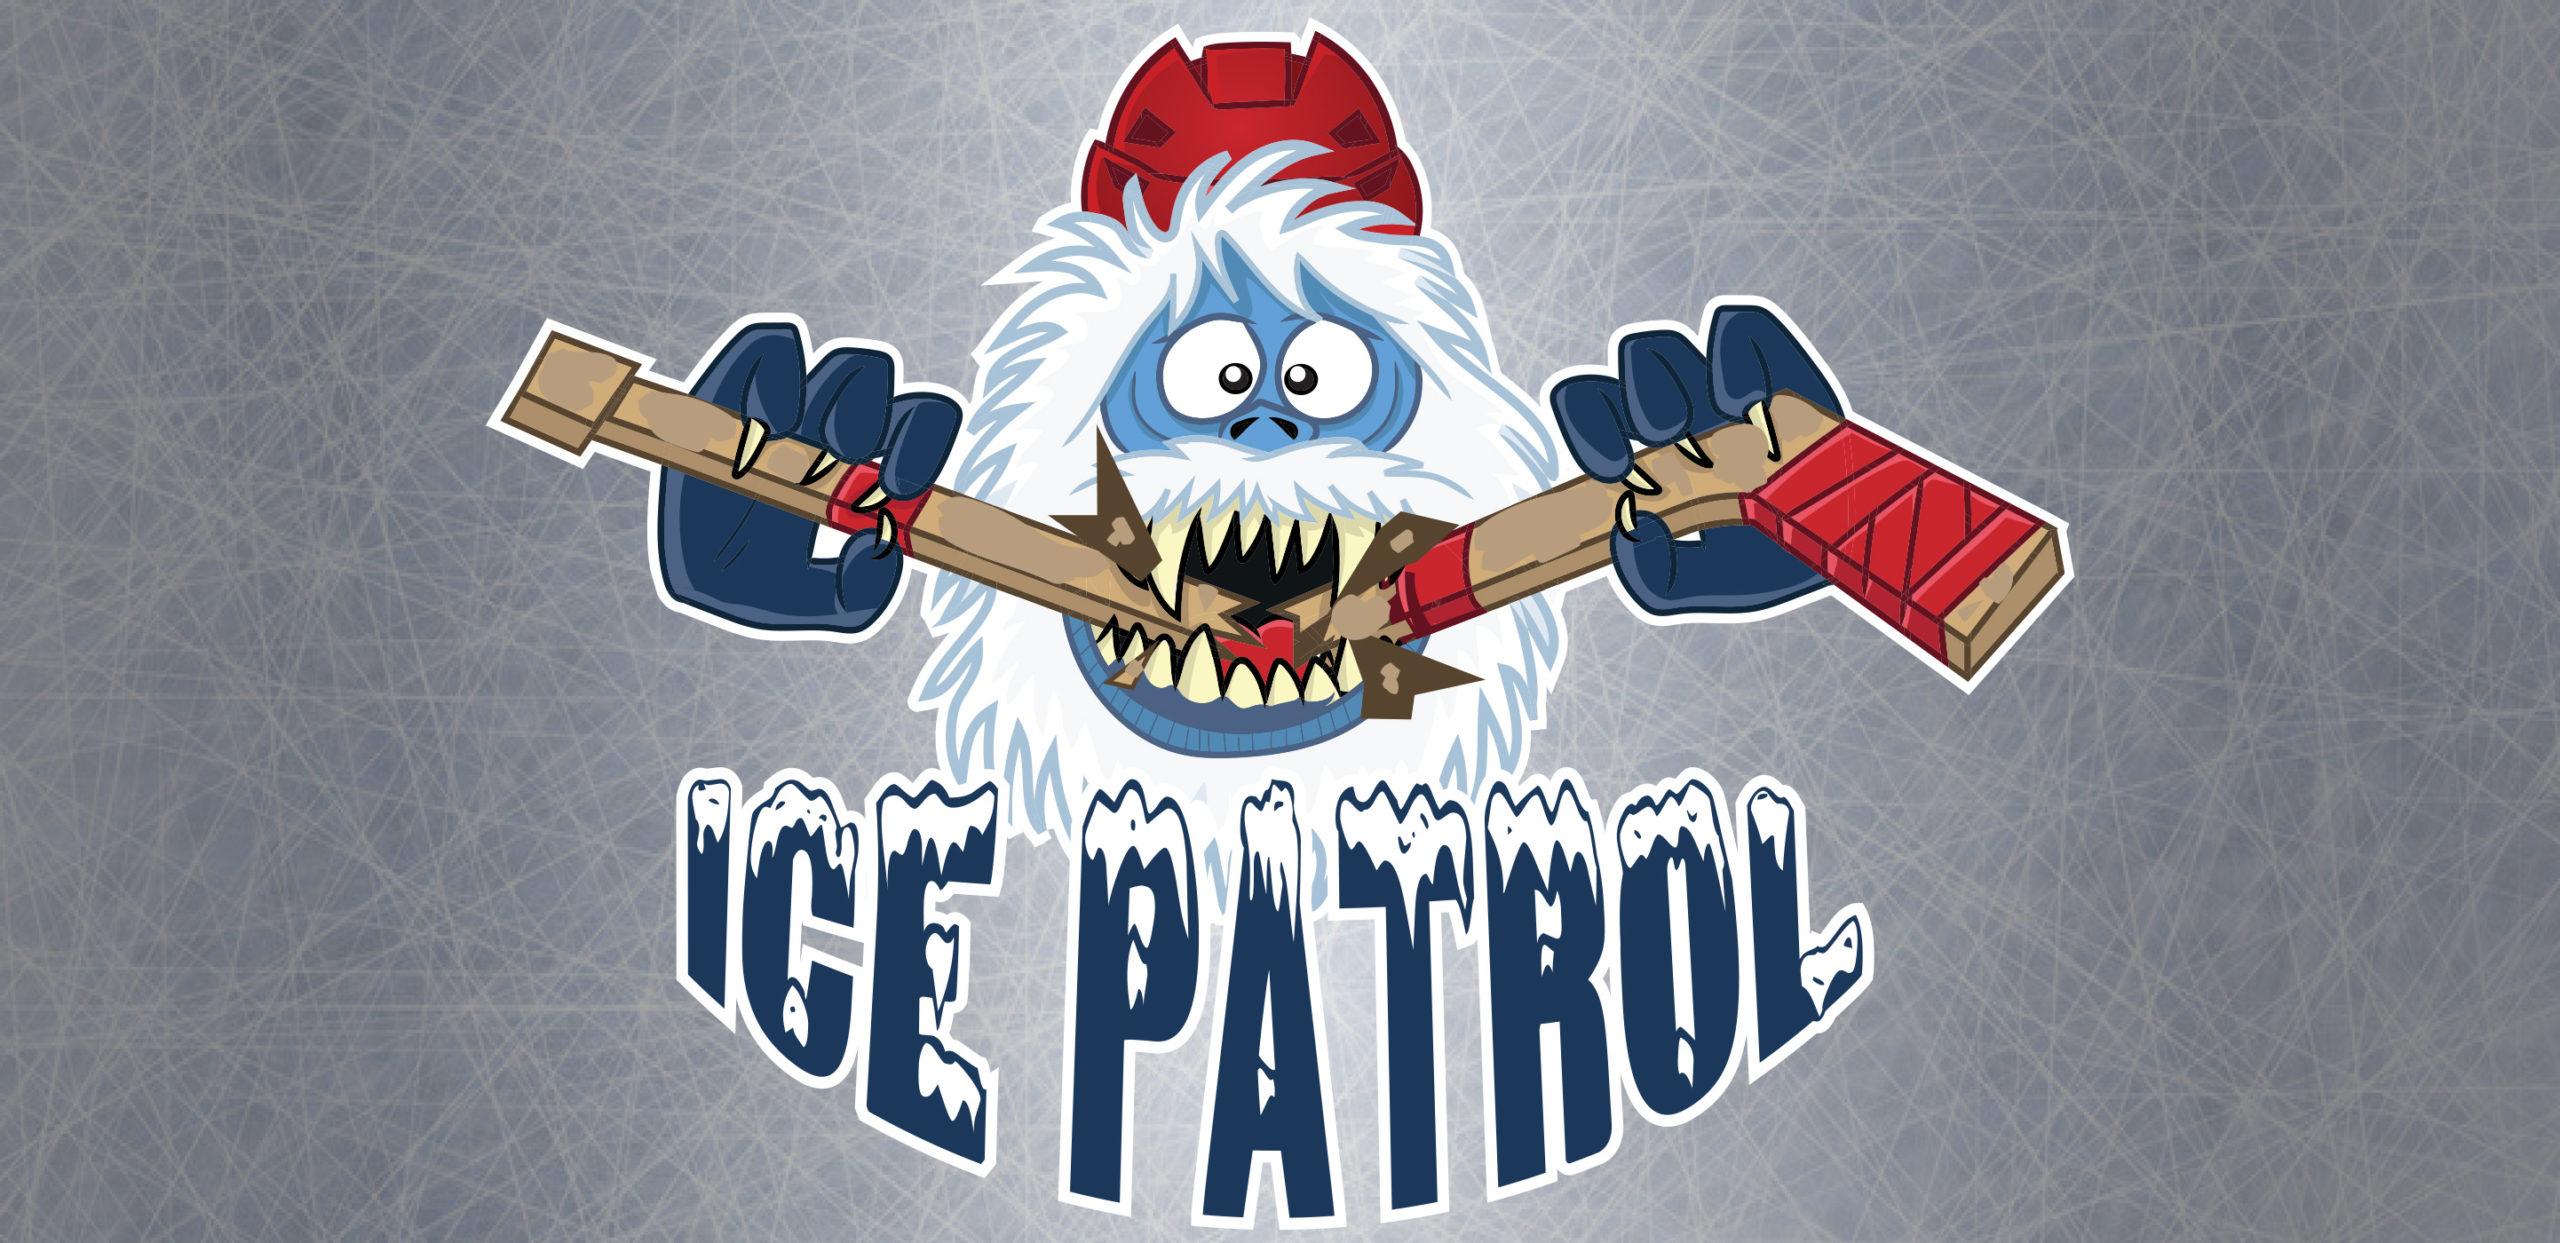 Q104 Ice Patrol